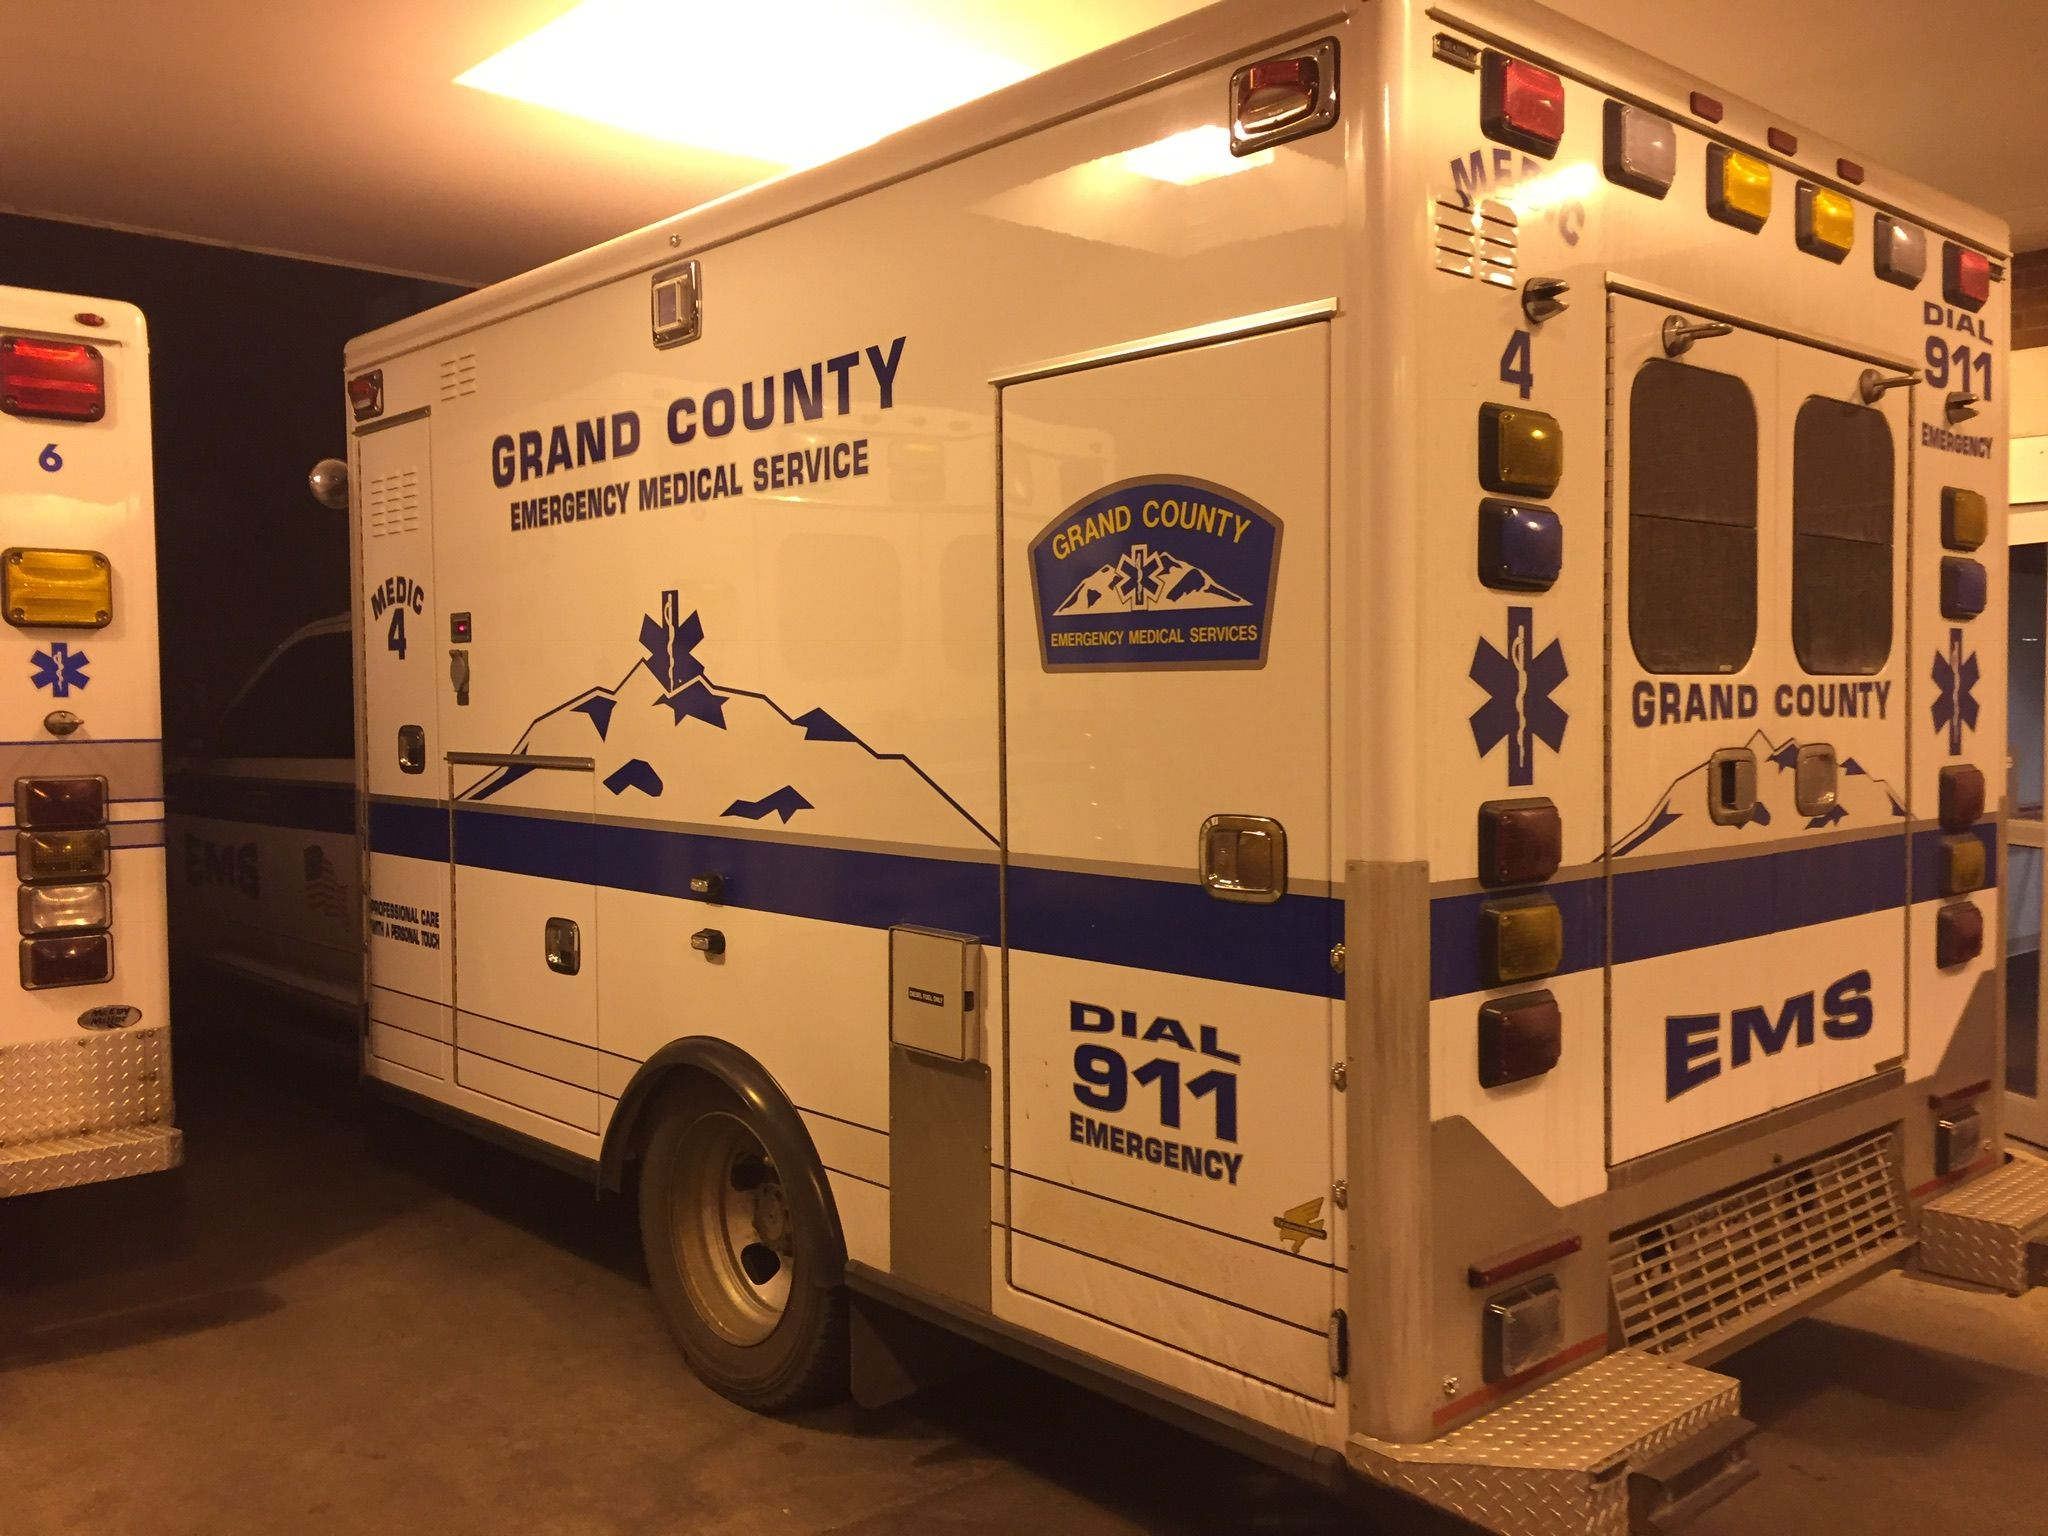 Pin by Kevin Neu on Ambulances | Emergency medical ...